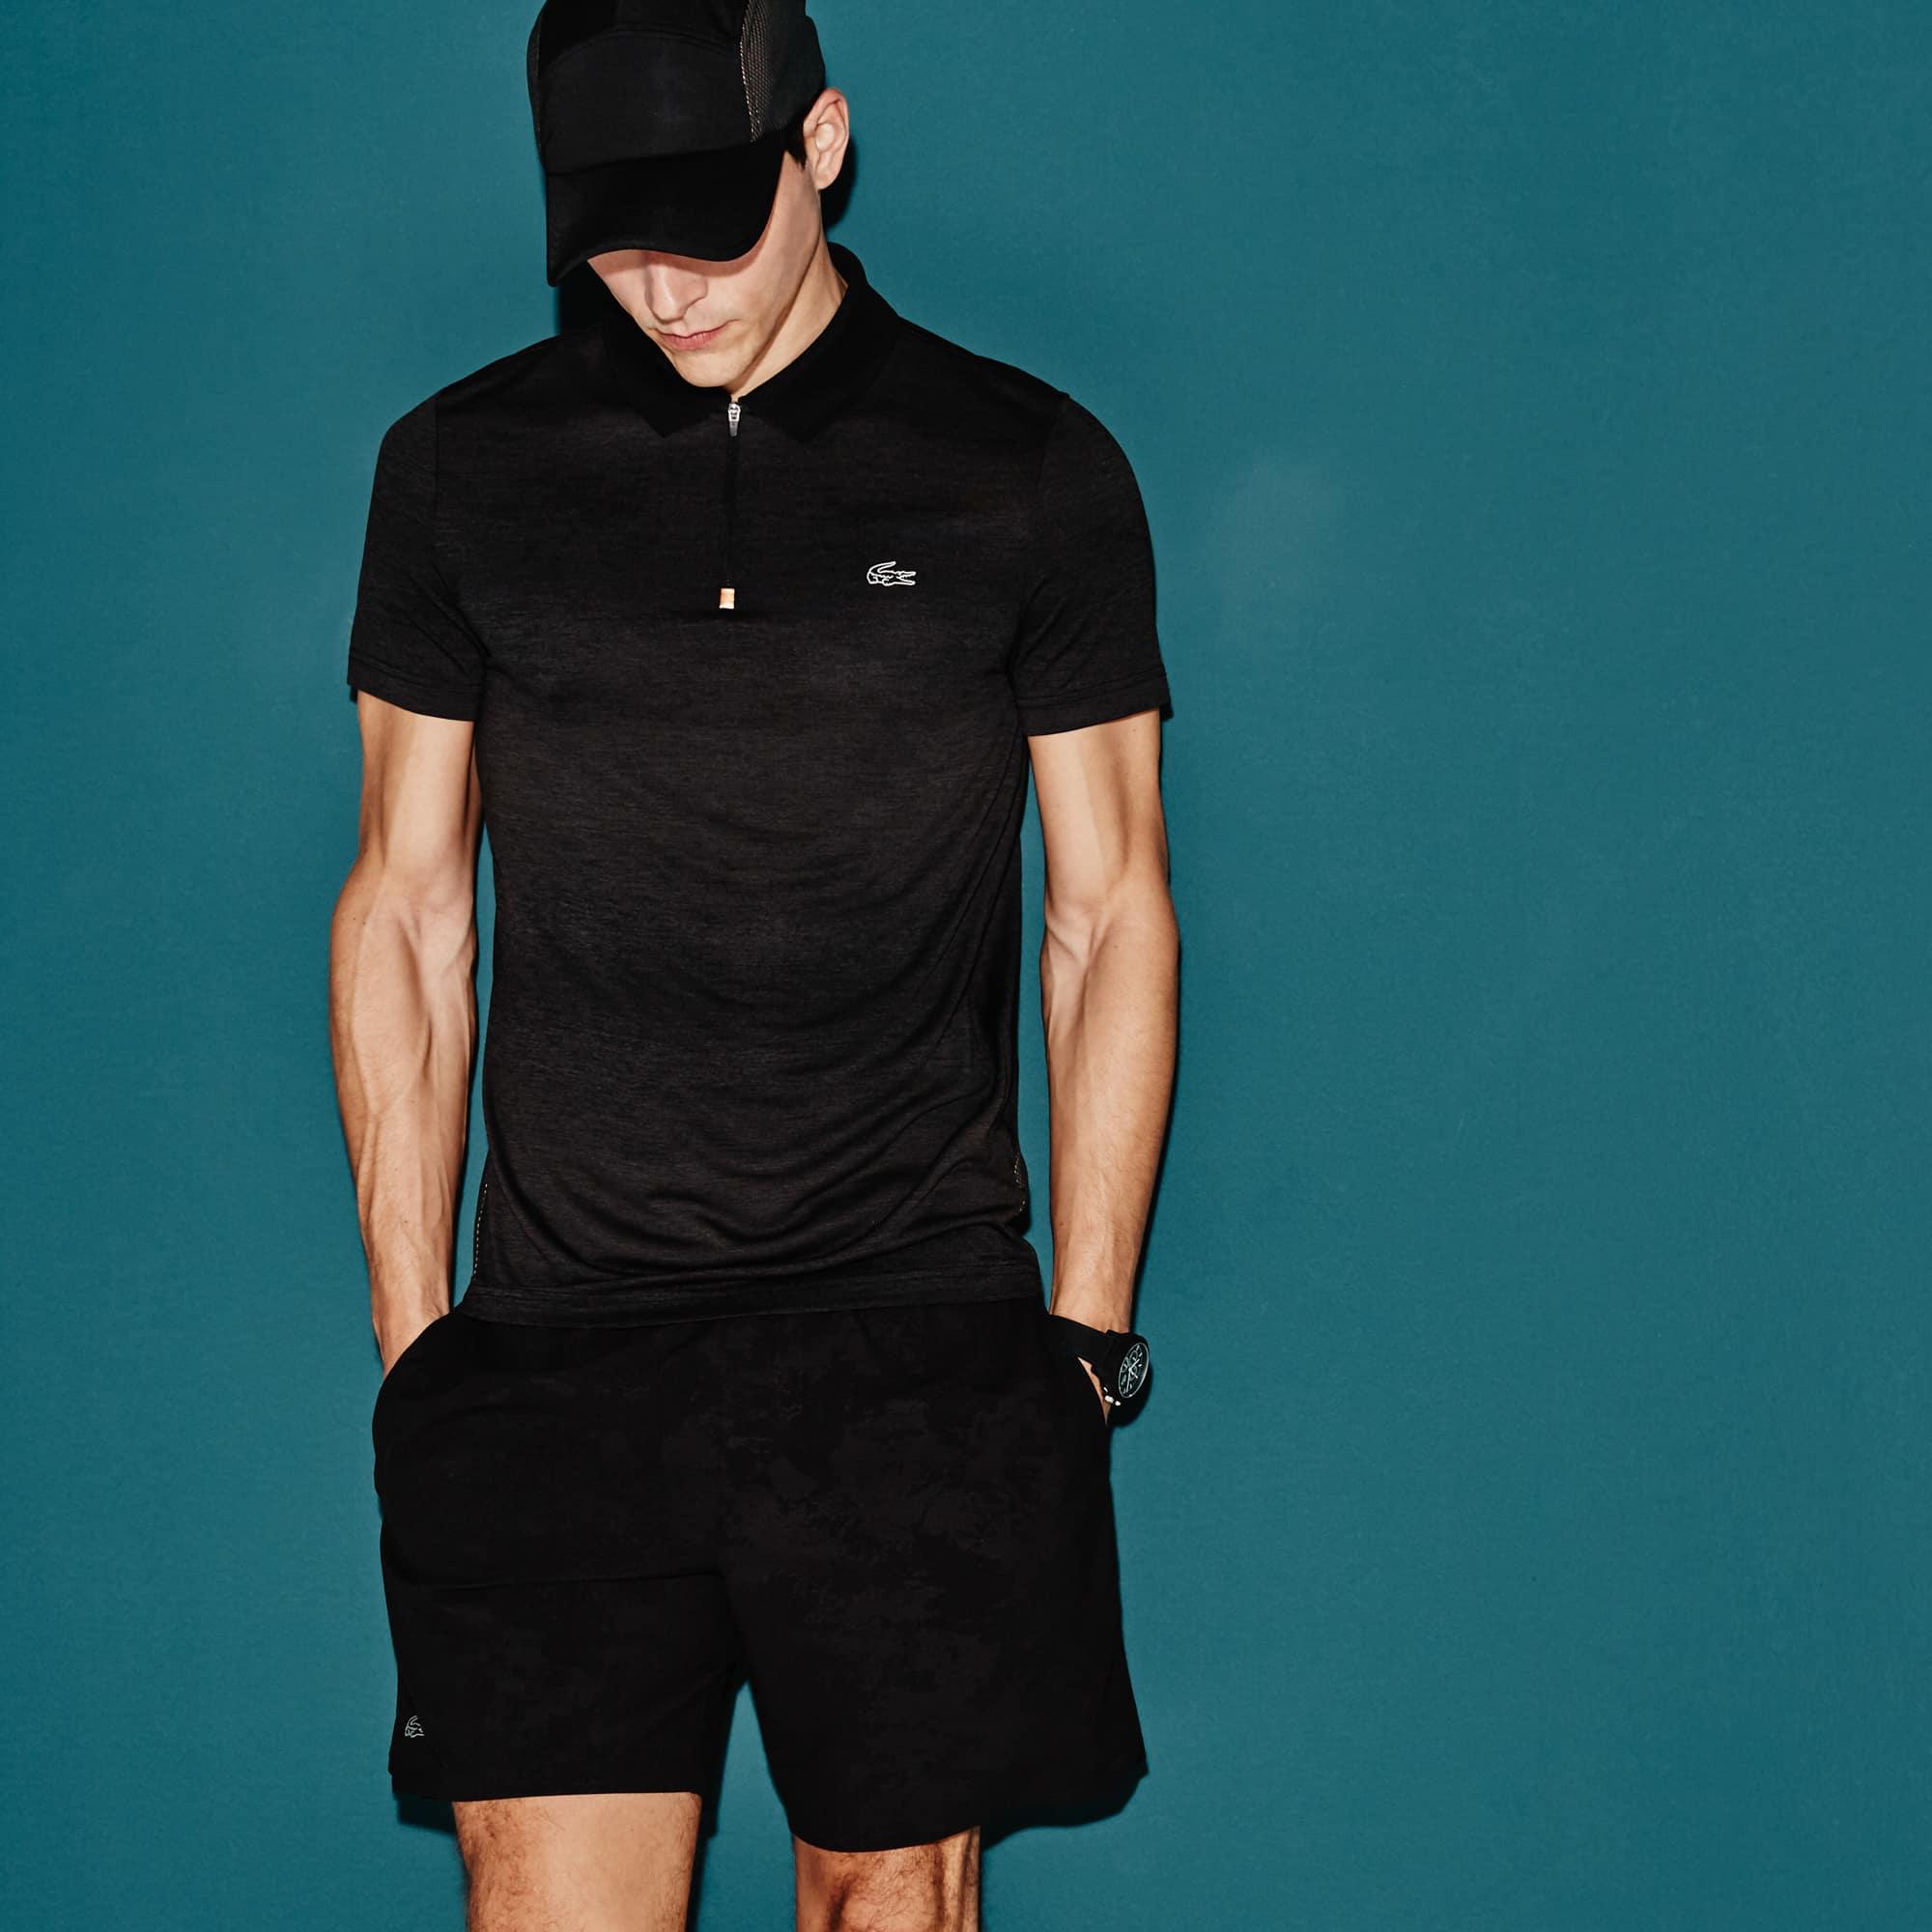 Polo col zippé Tennis Lacoste SPORT en jersey technique dos contrasté